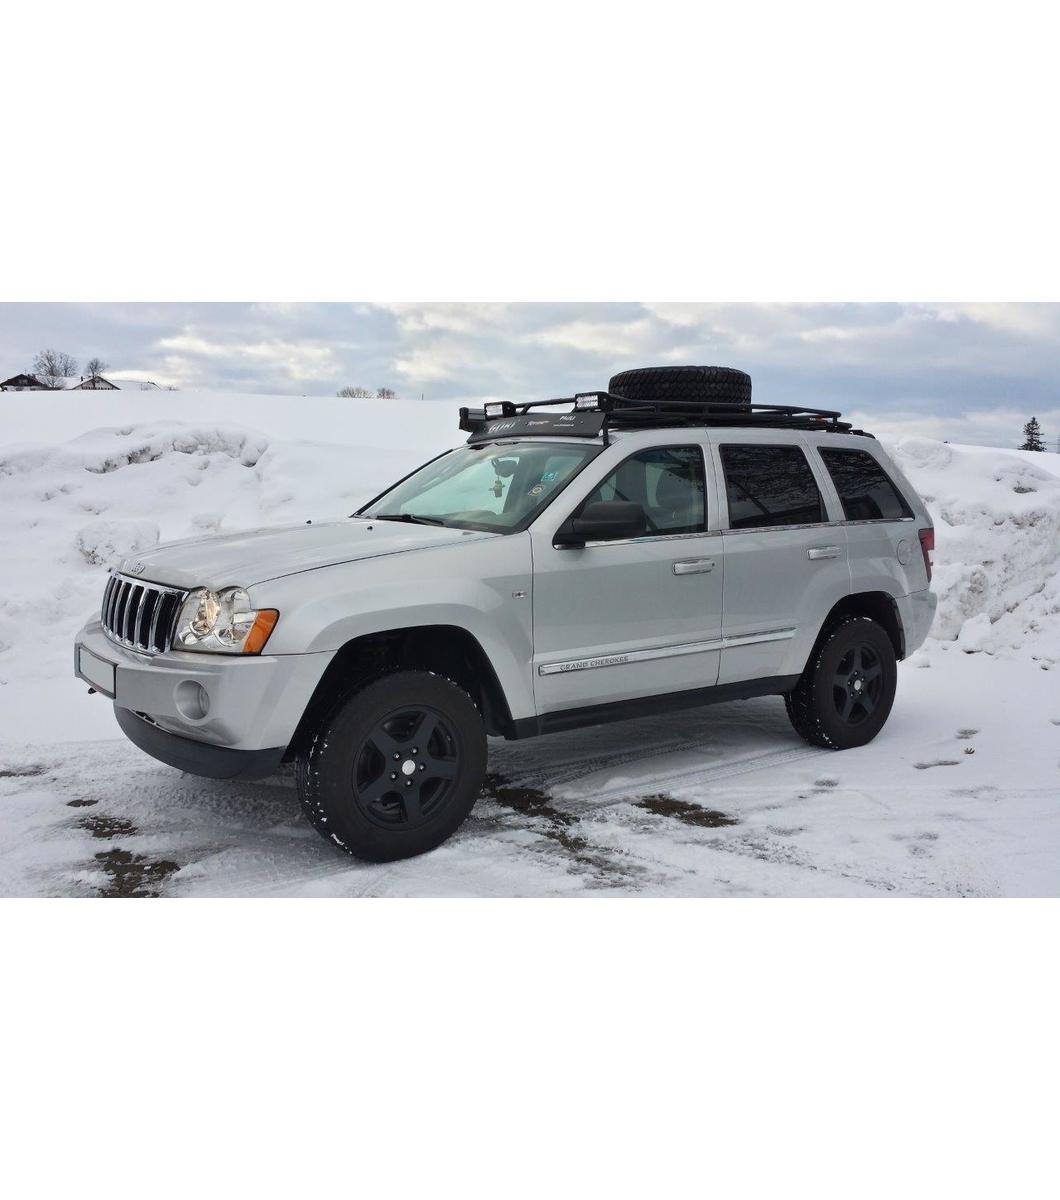 2002 Lights Grand Roof Cherokee Jeep